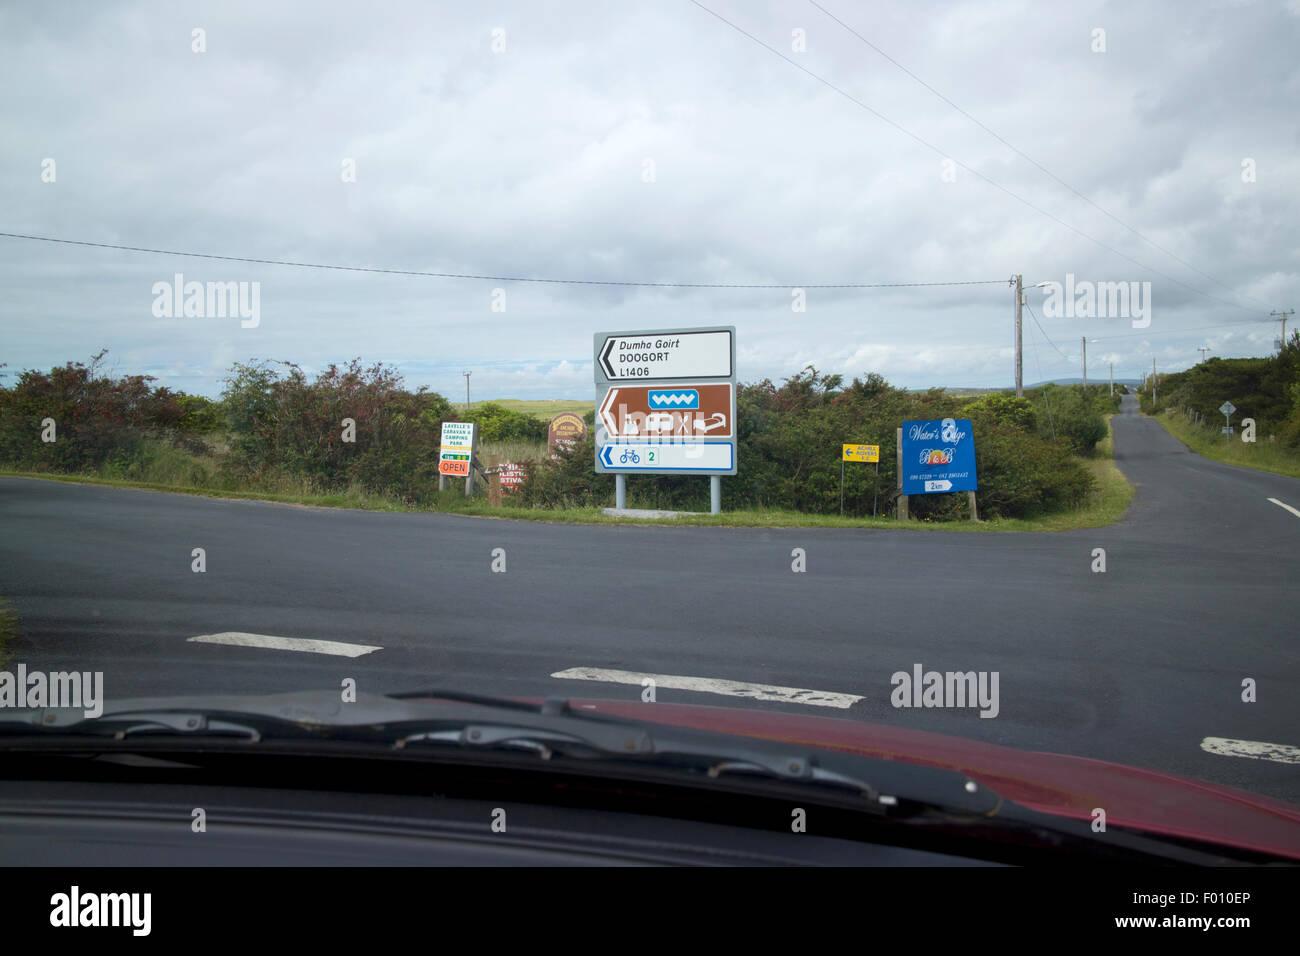 driving the wild atlantic way Achill Island, County Mayo, Ireland - Stock Image